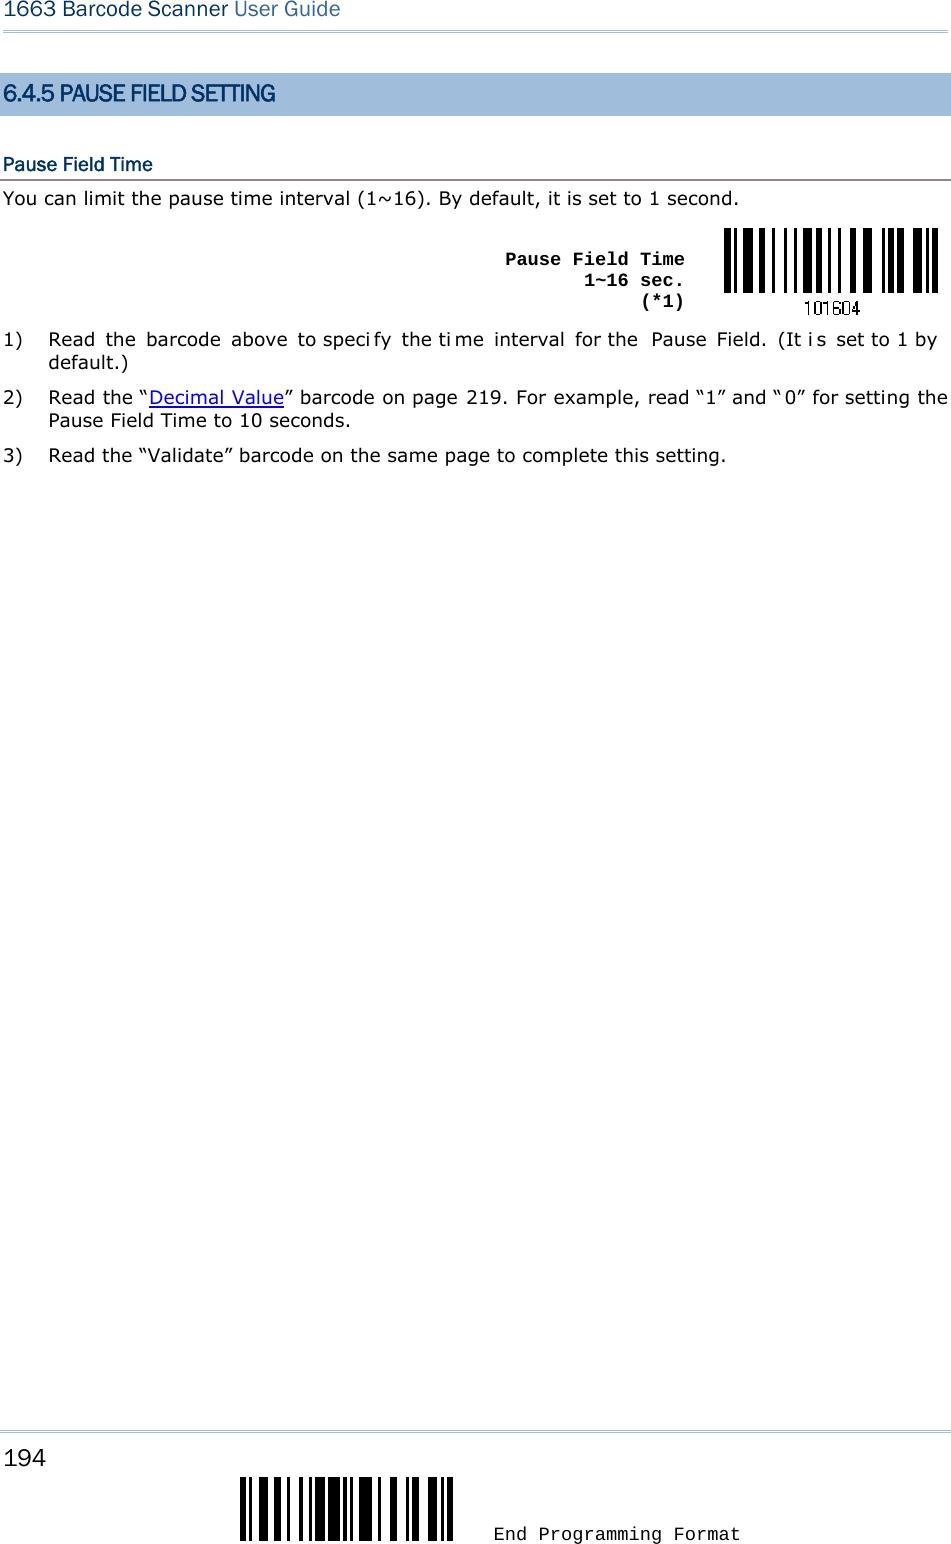 CipherLab 1663 Bluetooth Barcode Scanner User Manual 1663 Barcode